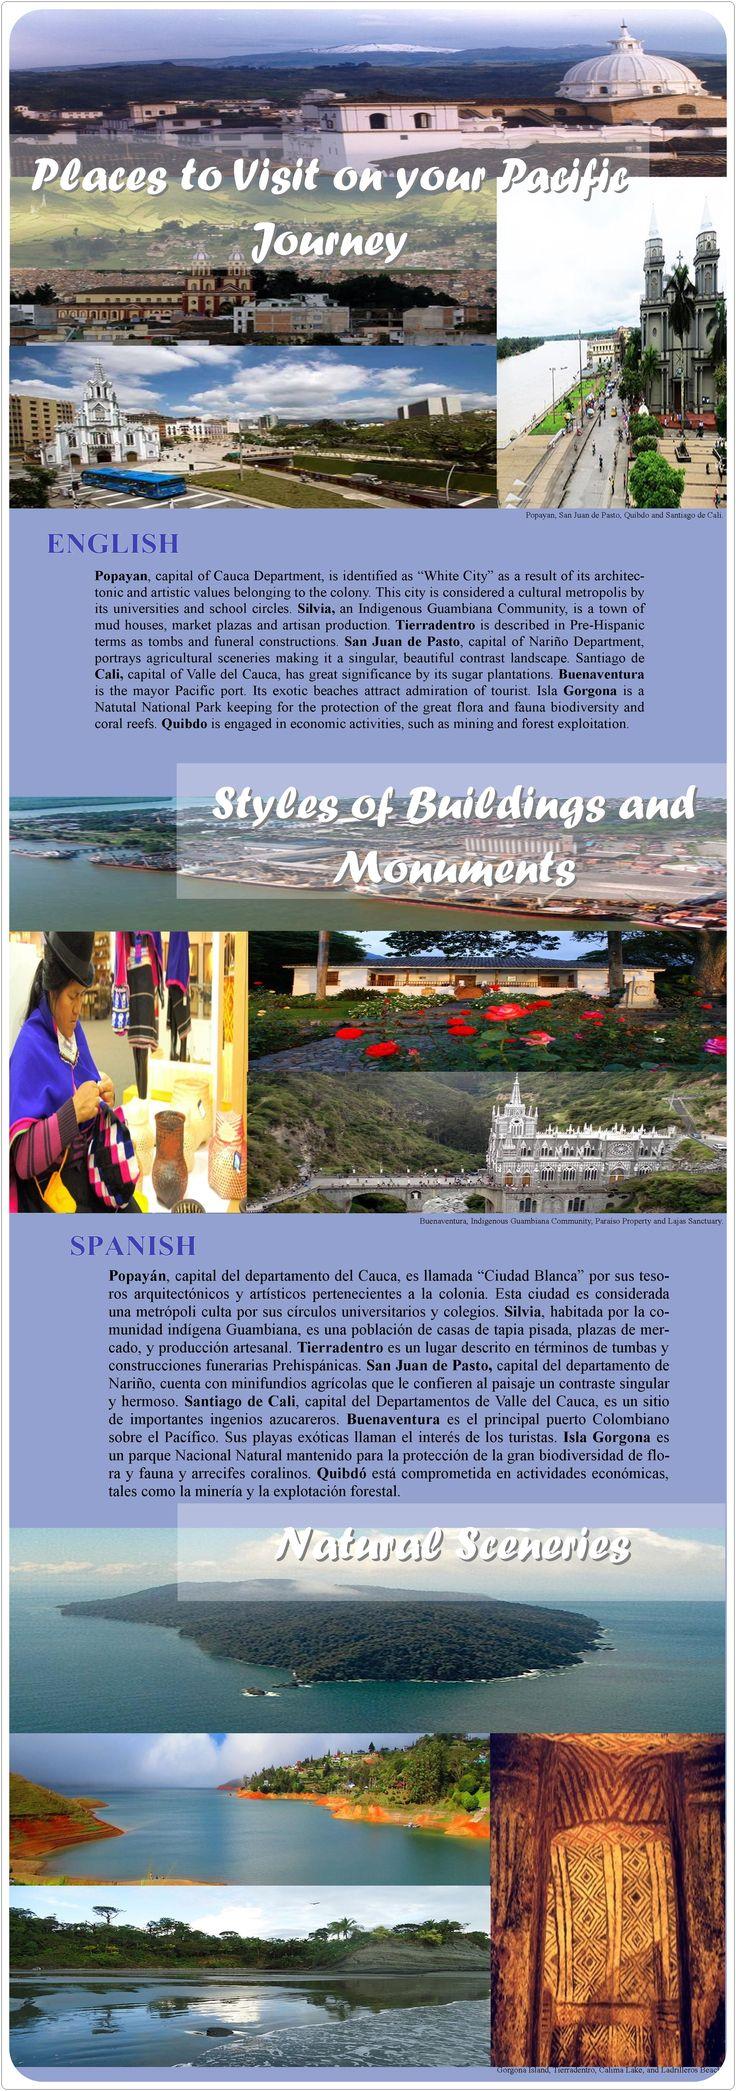 Places to Visit on your Pacific Journey: Popayan, San Juan de Pasto, Quibdo and Santiago de Cali, Buenaventura, Indigenous Guambiana Community, Paraíso Property, Lajas Sanctuary,  Gorgona Island, Tierradentro, Calima Lake, and Ladrilleros Beach.